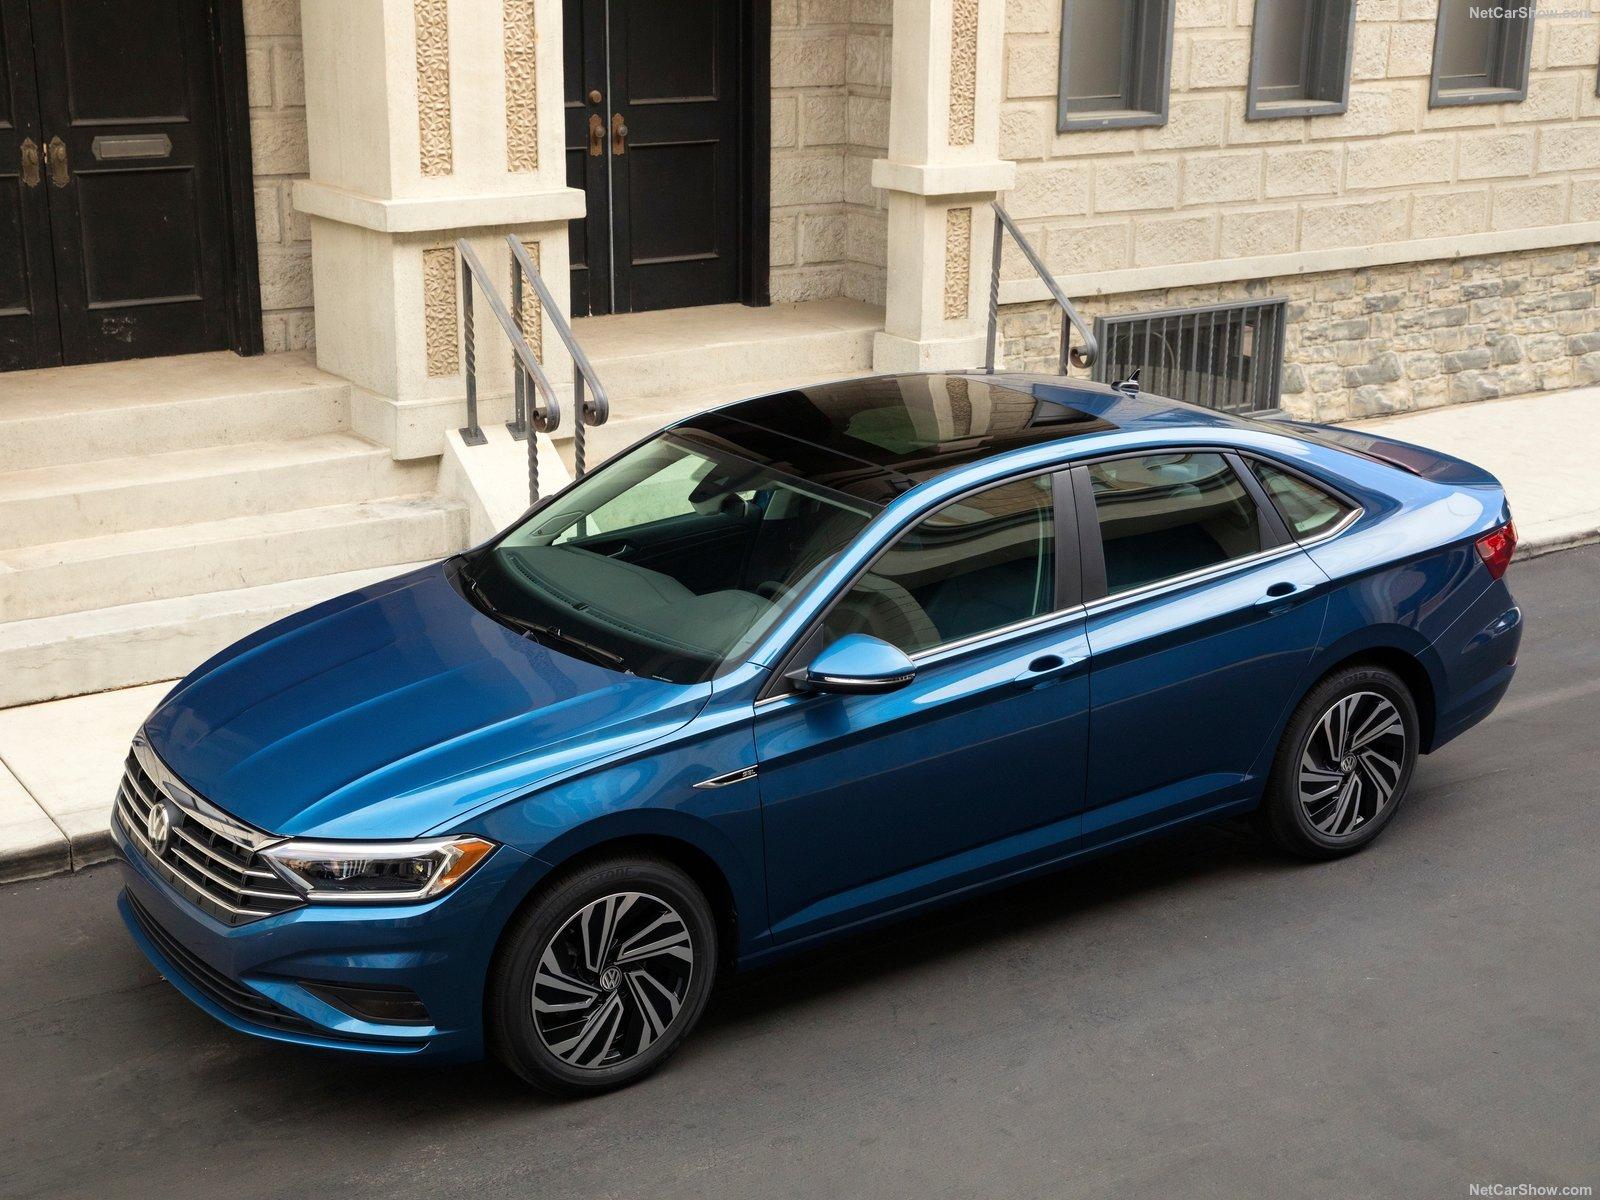 2019 Volkswagen Jetta - The Baby Audi - News/Articles/Motorists Education - PakWheels Forums